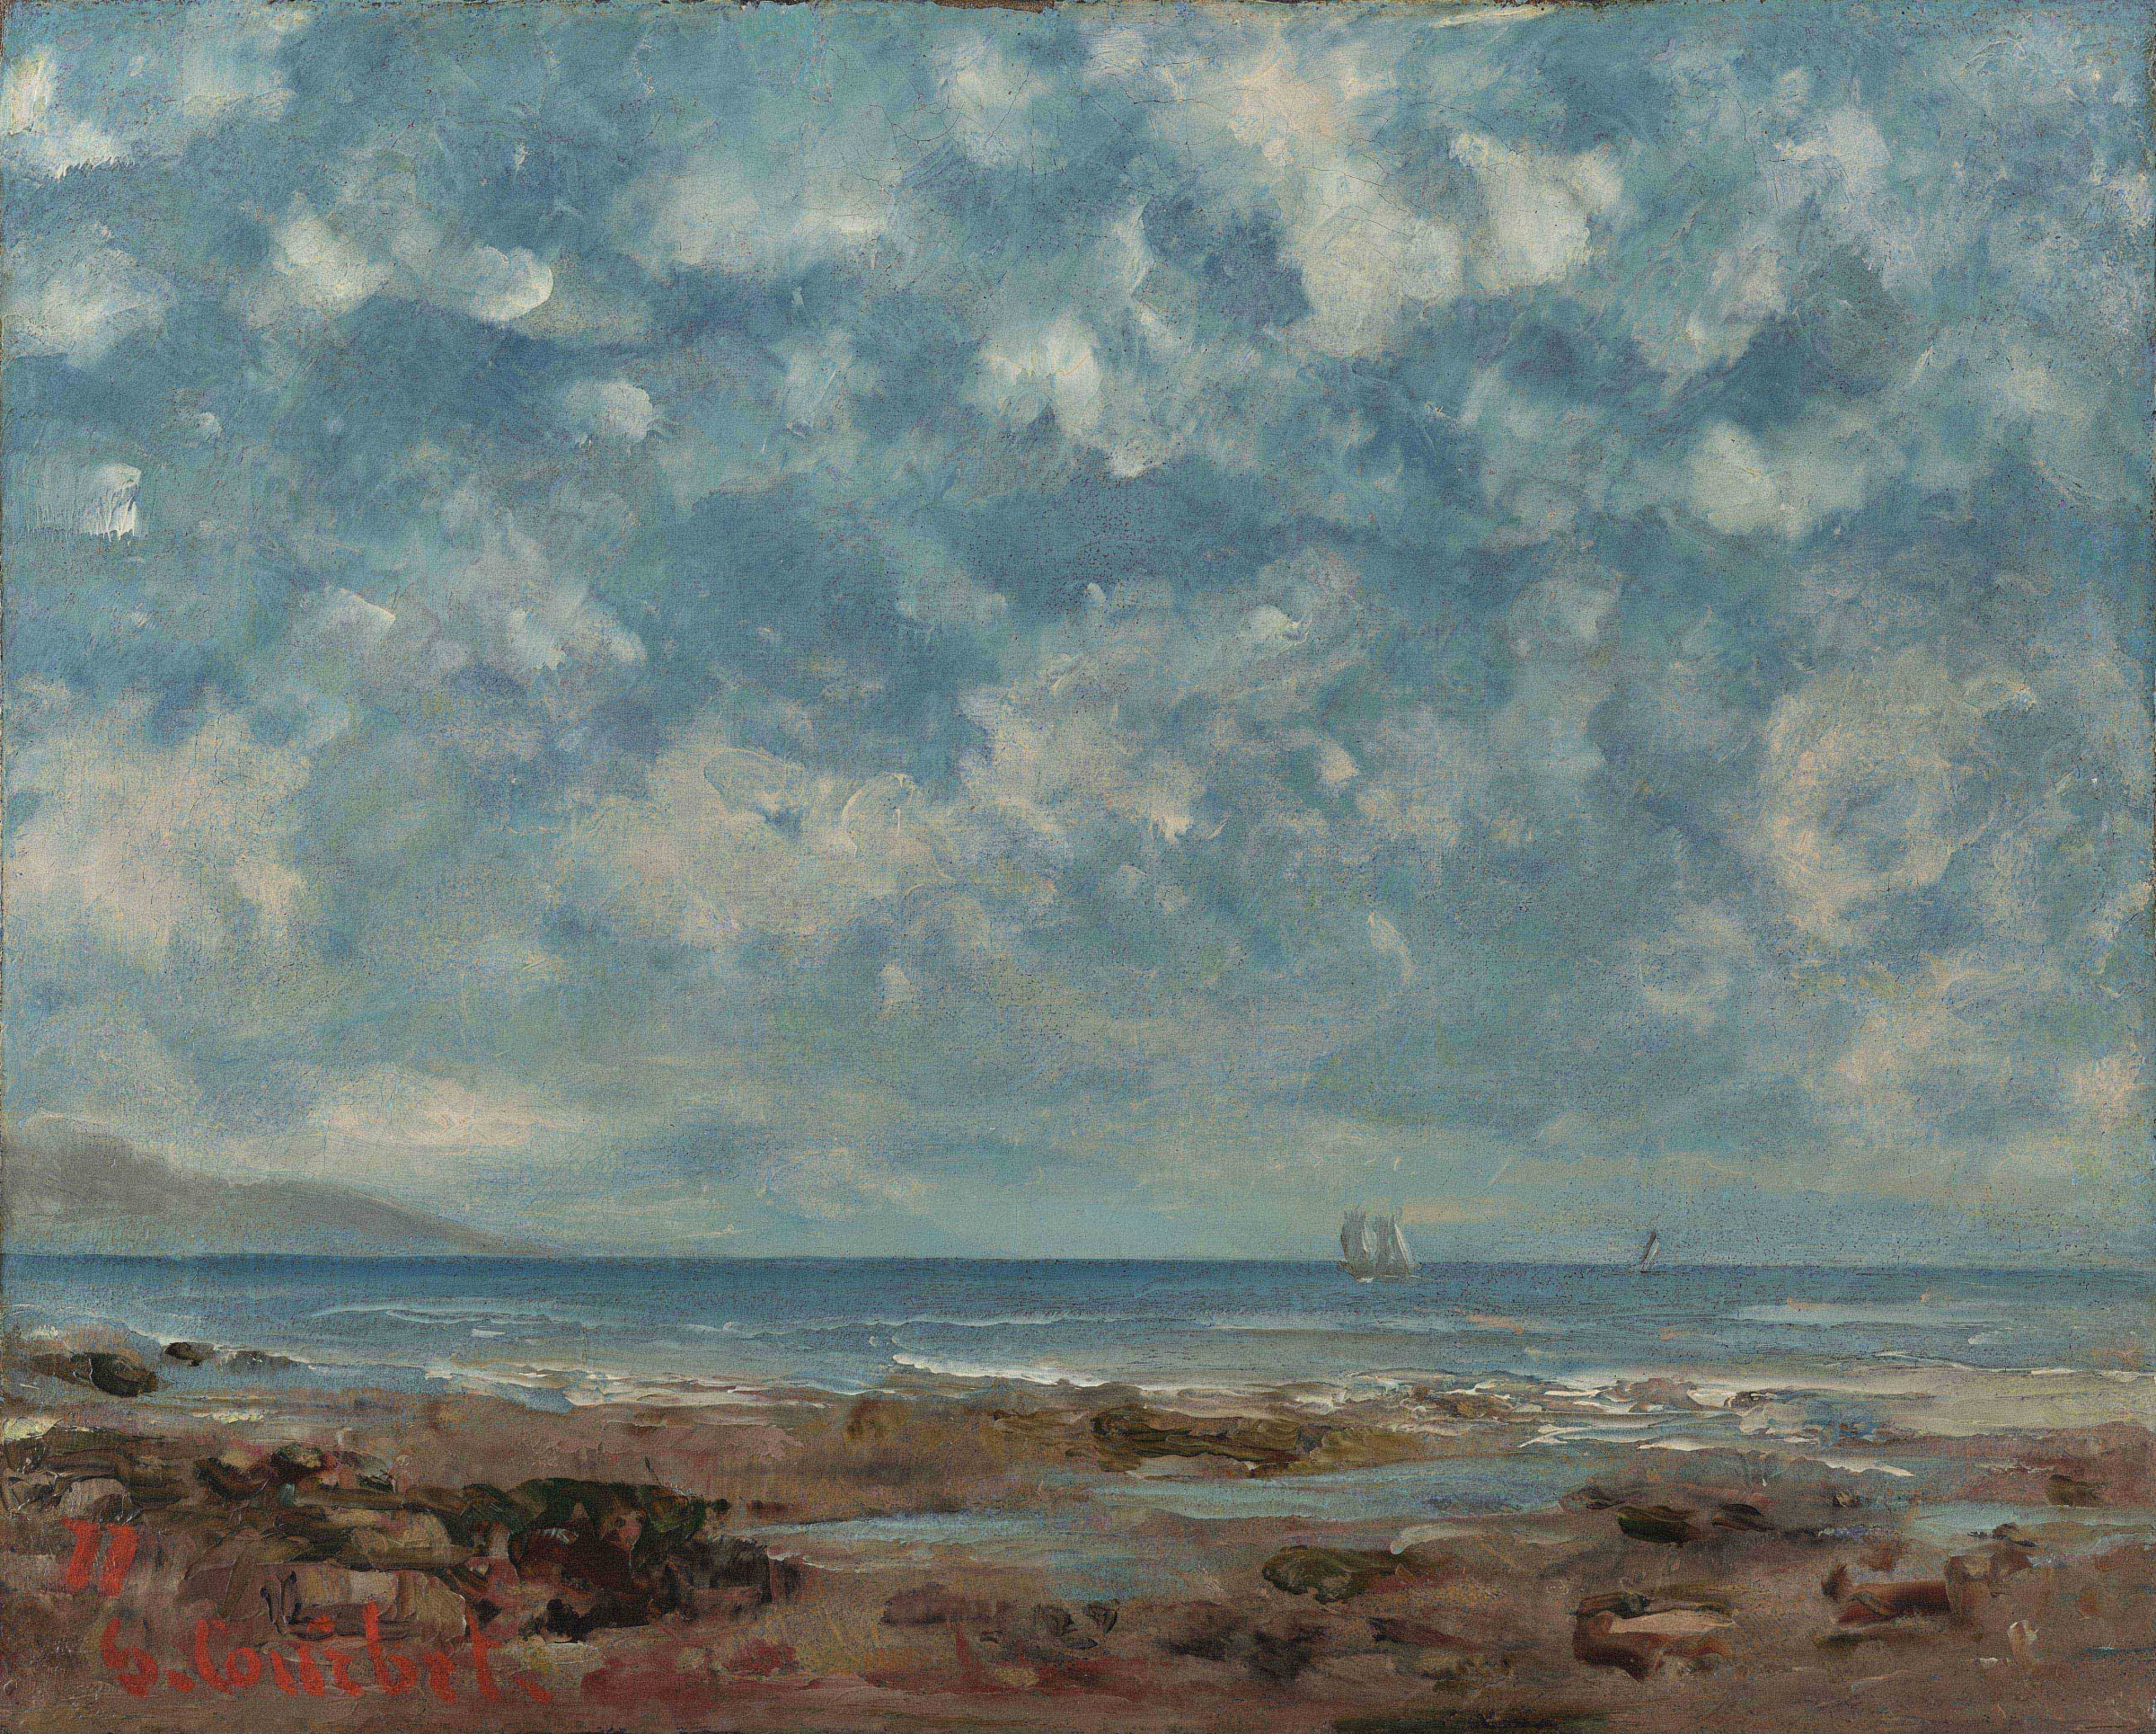 "<span class=""link fancybox-details-link""><a href=""/artists/31-gustave-courbet/works/9428-gustave-courbet-vue-du-lac-l-man-1877/"">View Detail Page</a></span><div class=""artist""><span class=""artist""><strong>Gustave Courbet</strong></span></div><div class=""title""><em>Vue du Lac Léman</em>, 1877</div><div class=""signed_and_dated"">Signed and dated lower left '.77 G.Courbet'</div><div class=""medium"">Oil on canvas</div><div class=""dimensions"">32.6 x 40.3 cm<br /> 12 8/9 x 15 8/9 inches</div>"